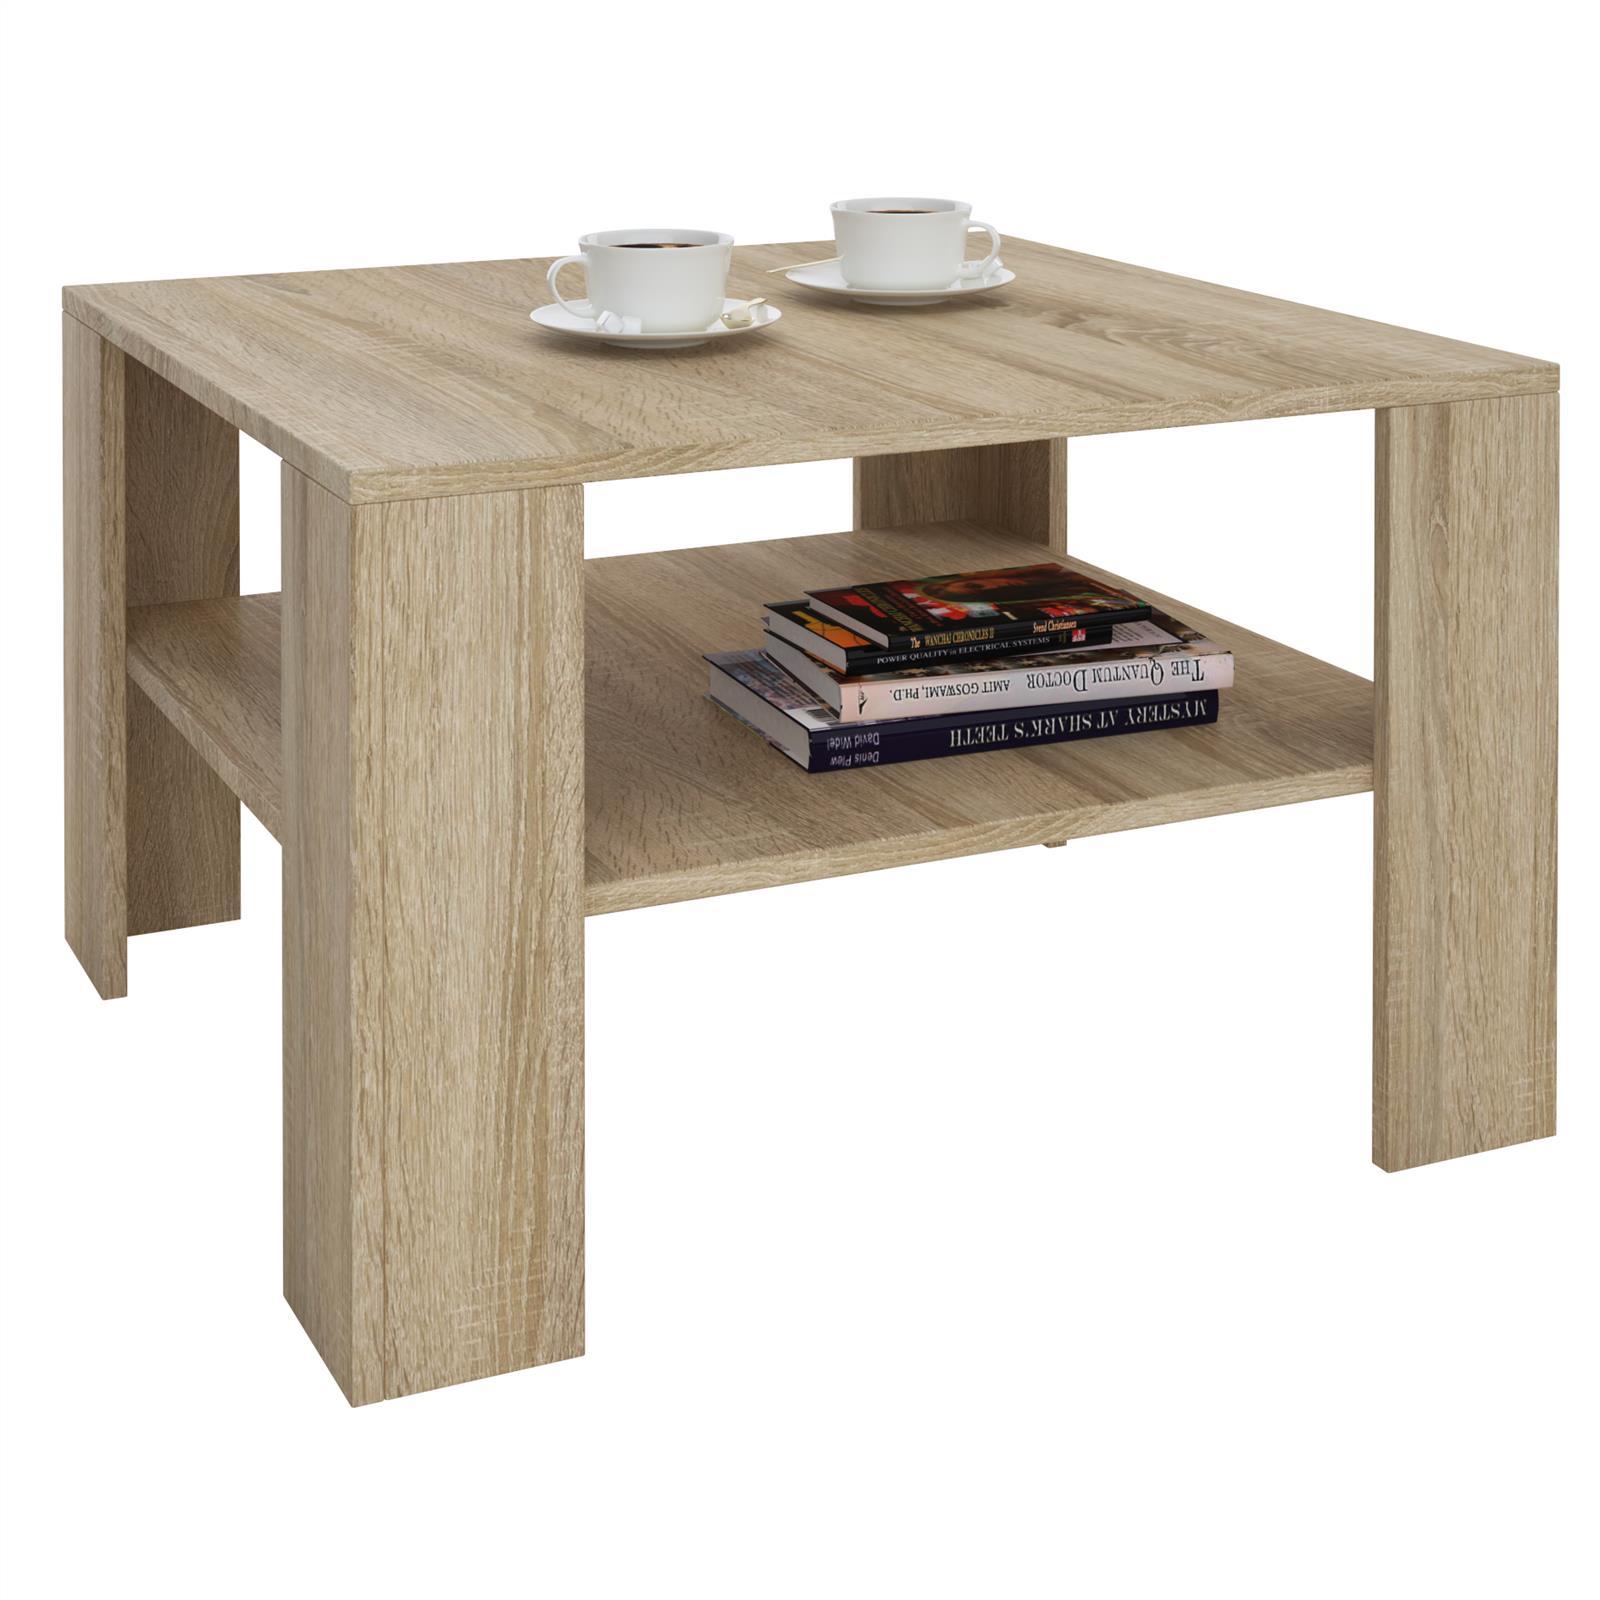 table basse sejour en m lamin d cor ch ne sonoma. Black Bedroom Furniture Sets. Home Design Ideas